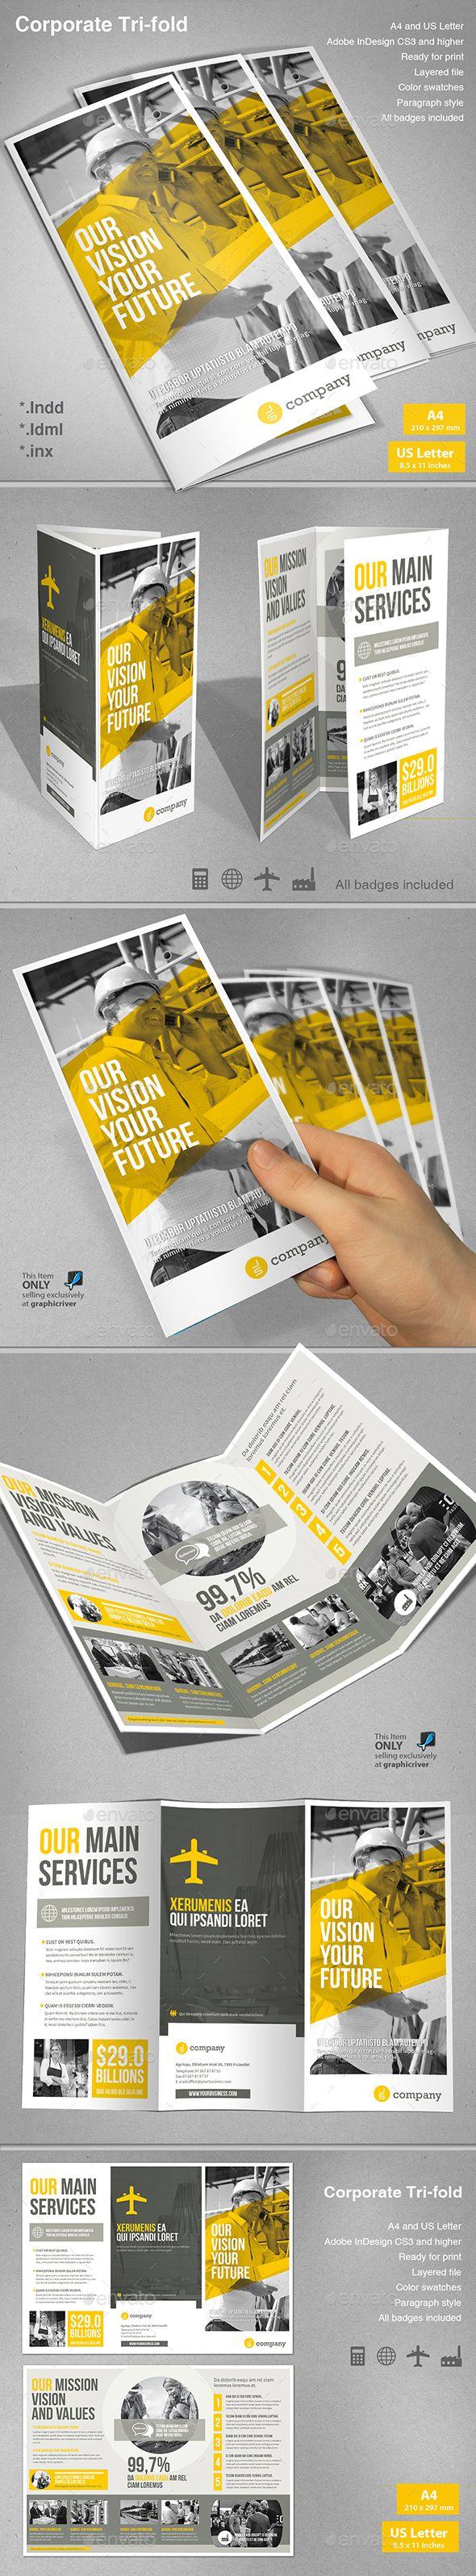 Corporate Tri-fold Brochure Template InDesign INDD